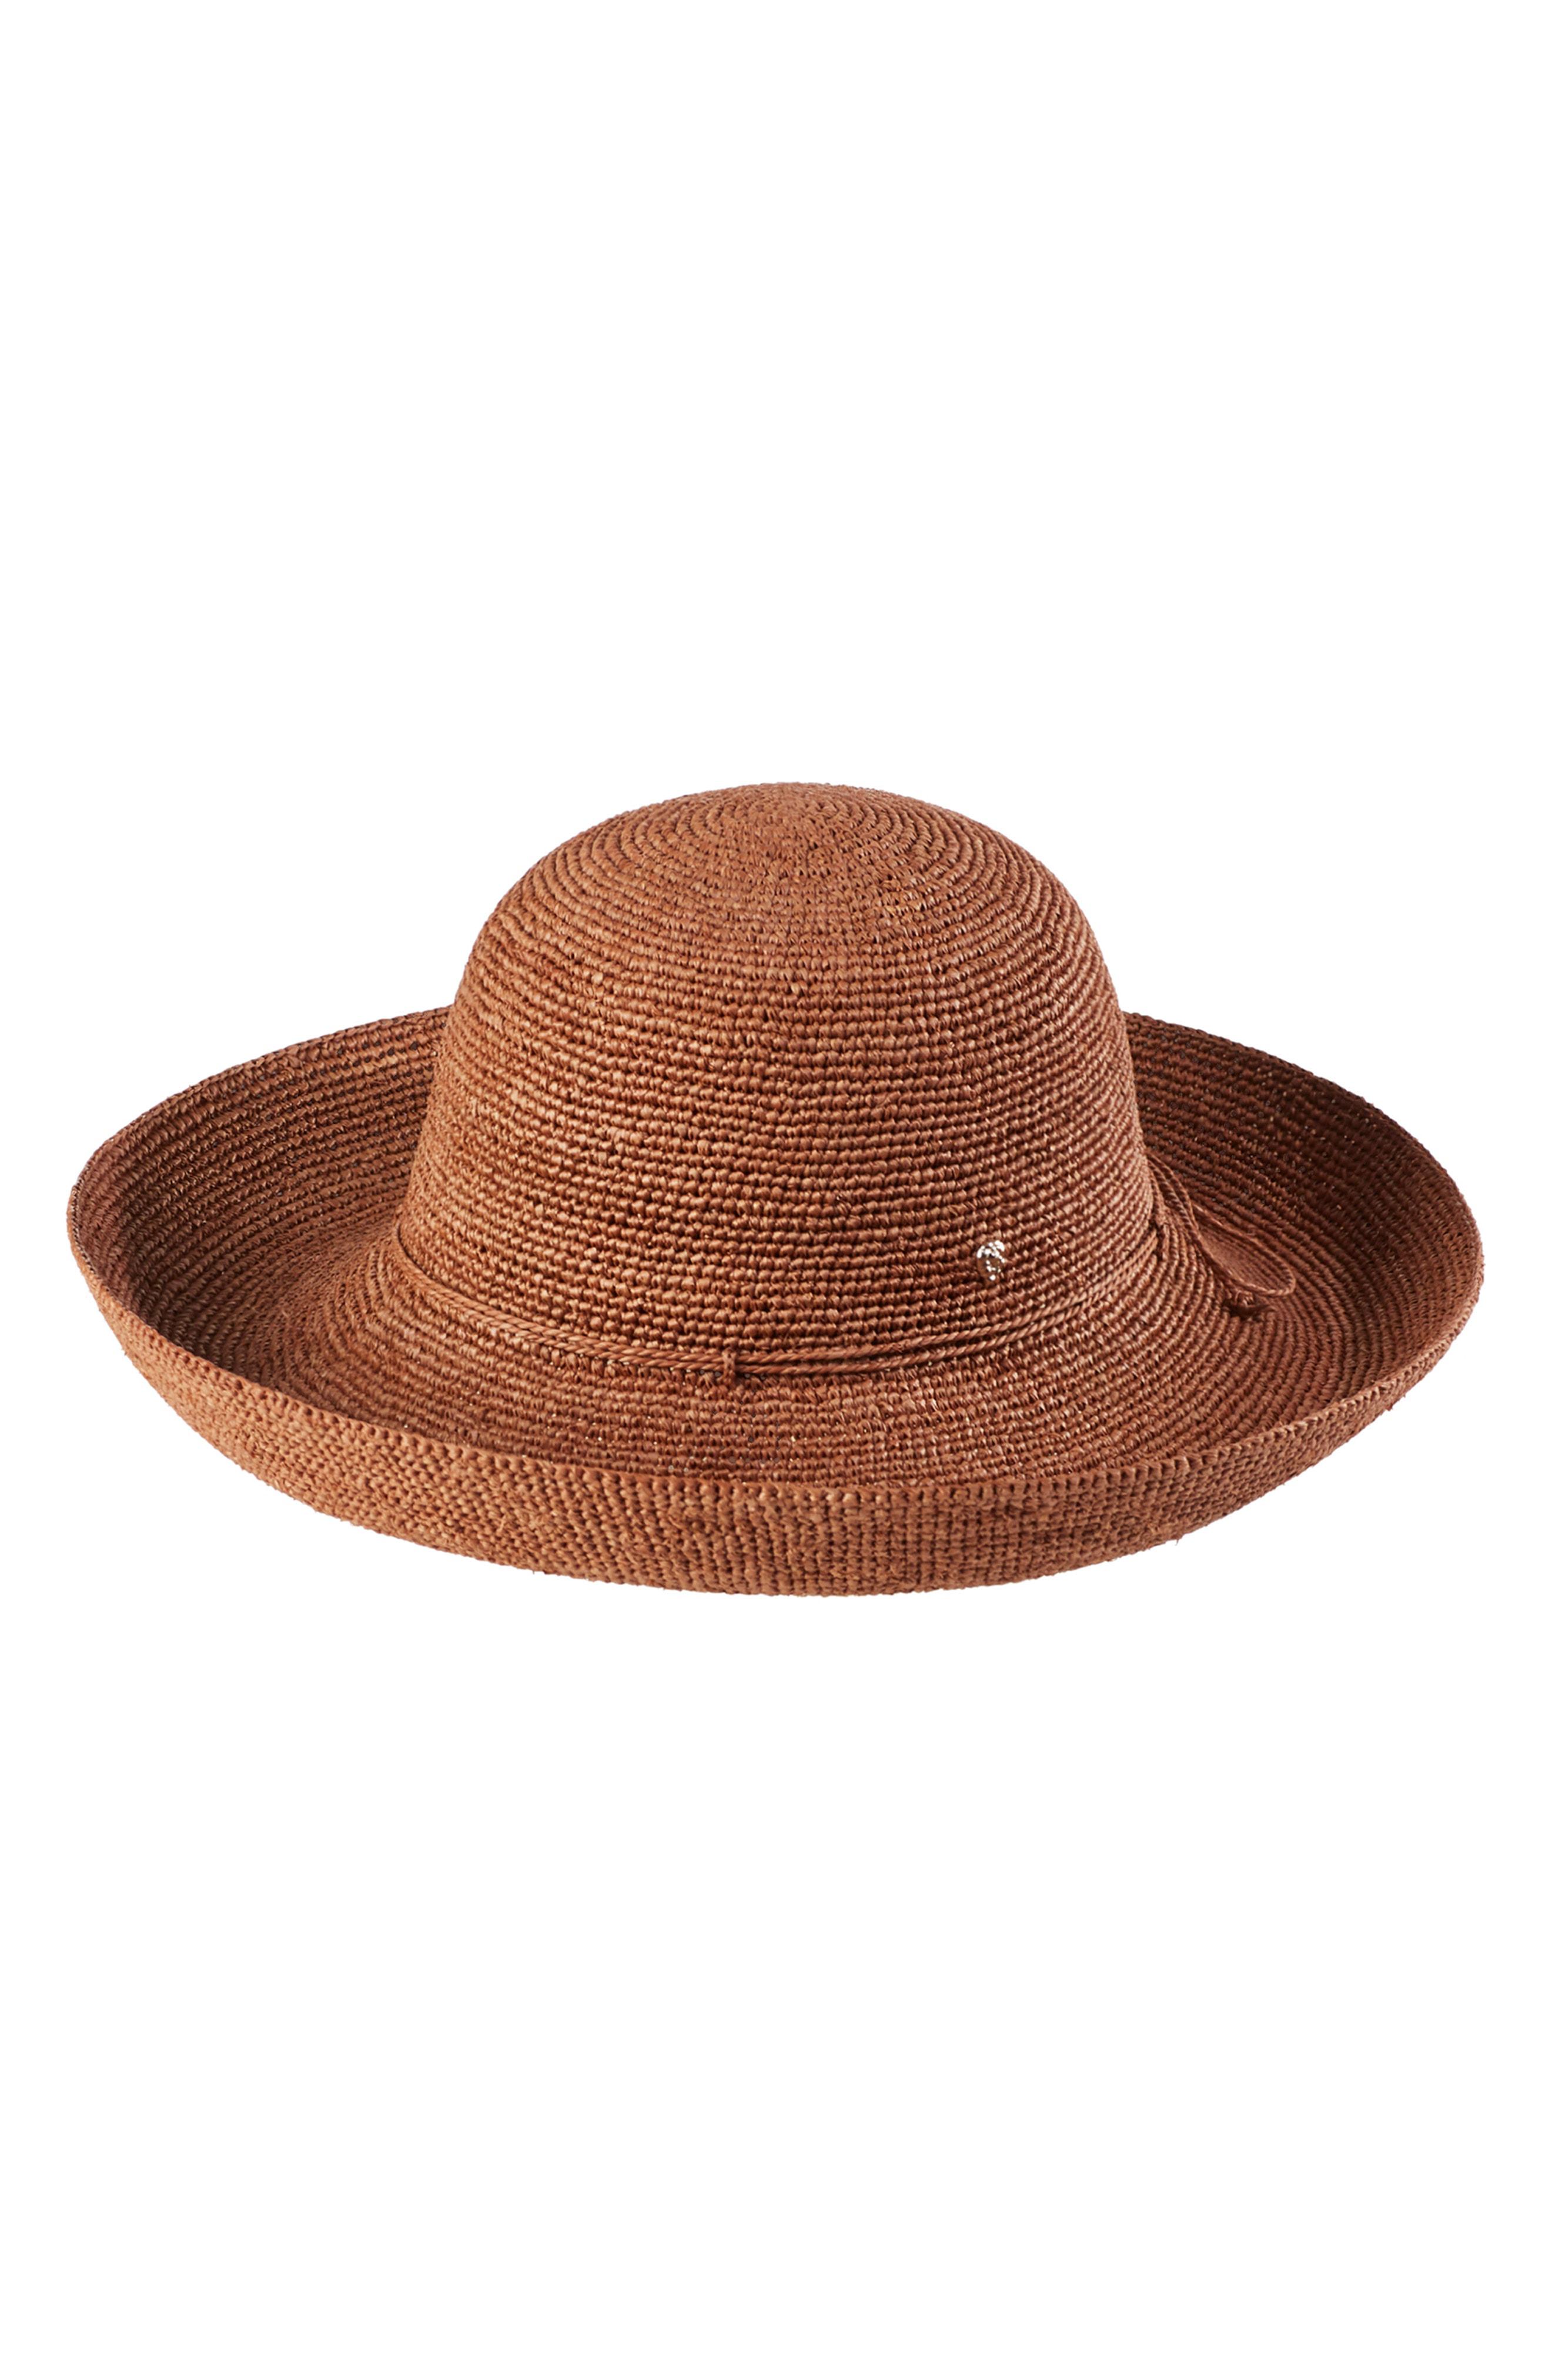 936e777064e7d Helen Kaminski  Provence 12  Packable Raffia Hat - Brown In Dark Maple